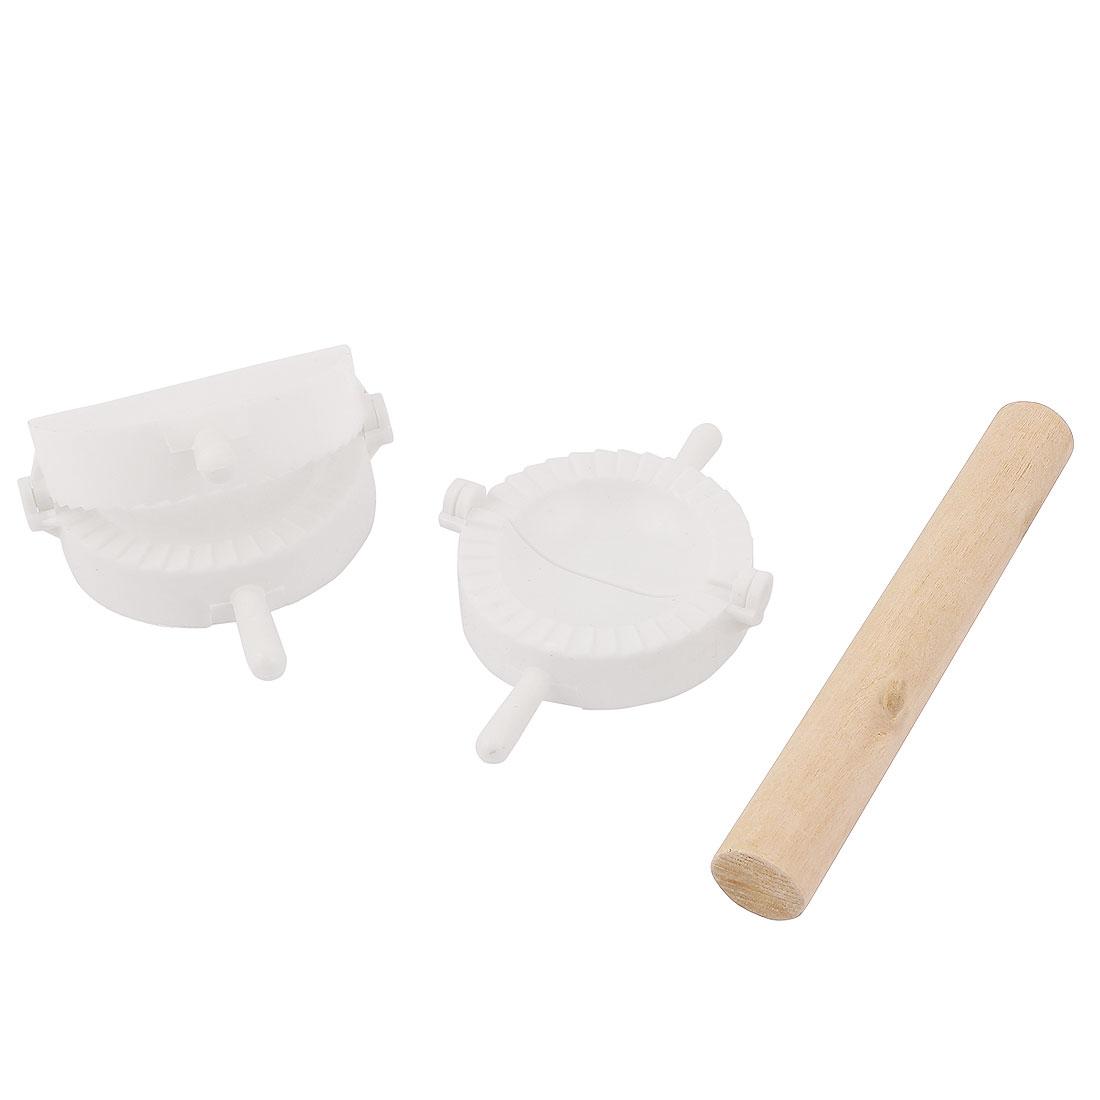 Dumpling Press Mold Pastry Ravioli Wonton DIY Maker Rolling Pin Set 3 in 1